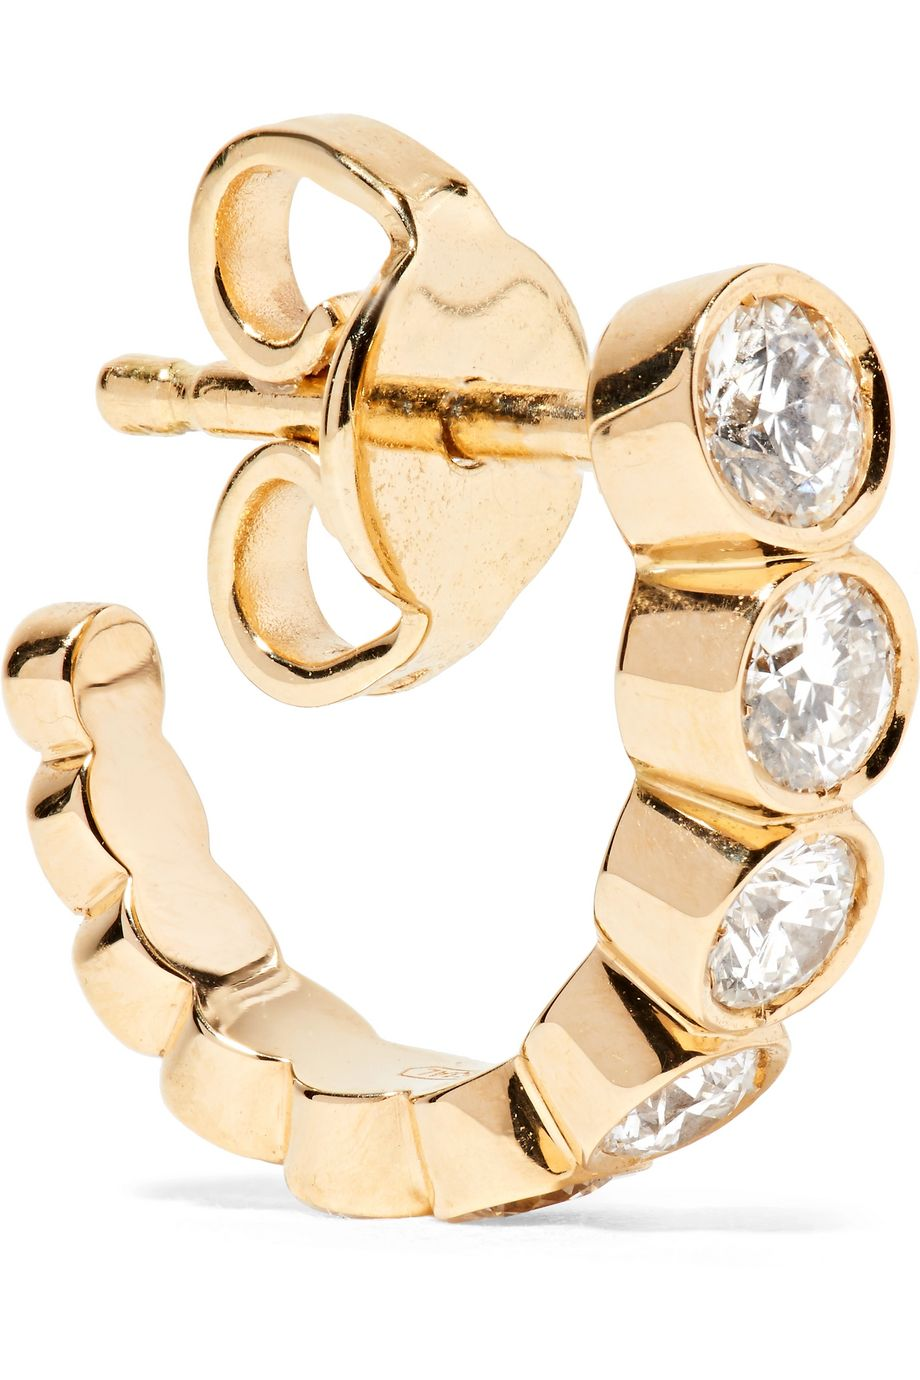 Sophie Bille Brahe Petite Boucle 18K 黄金钻石单只耳环